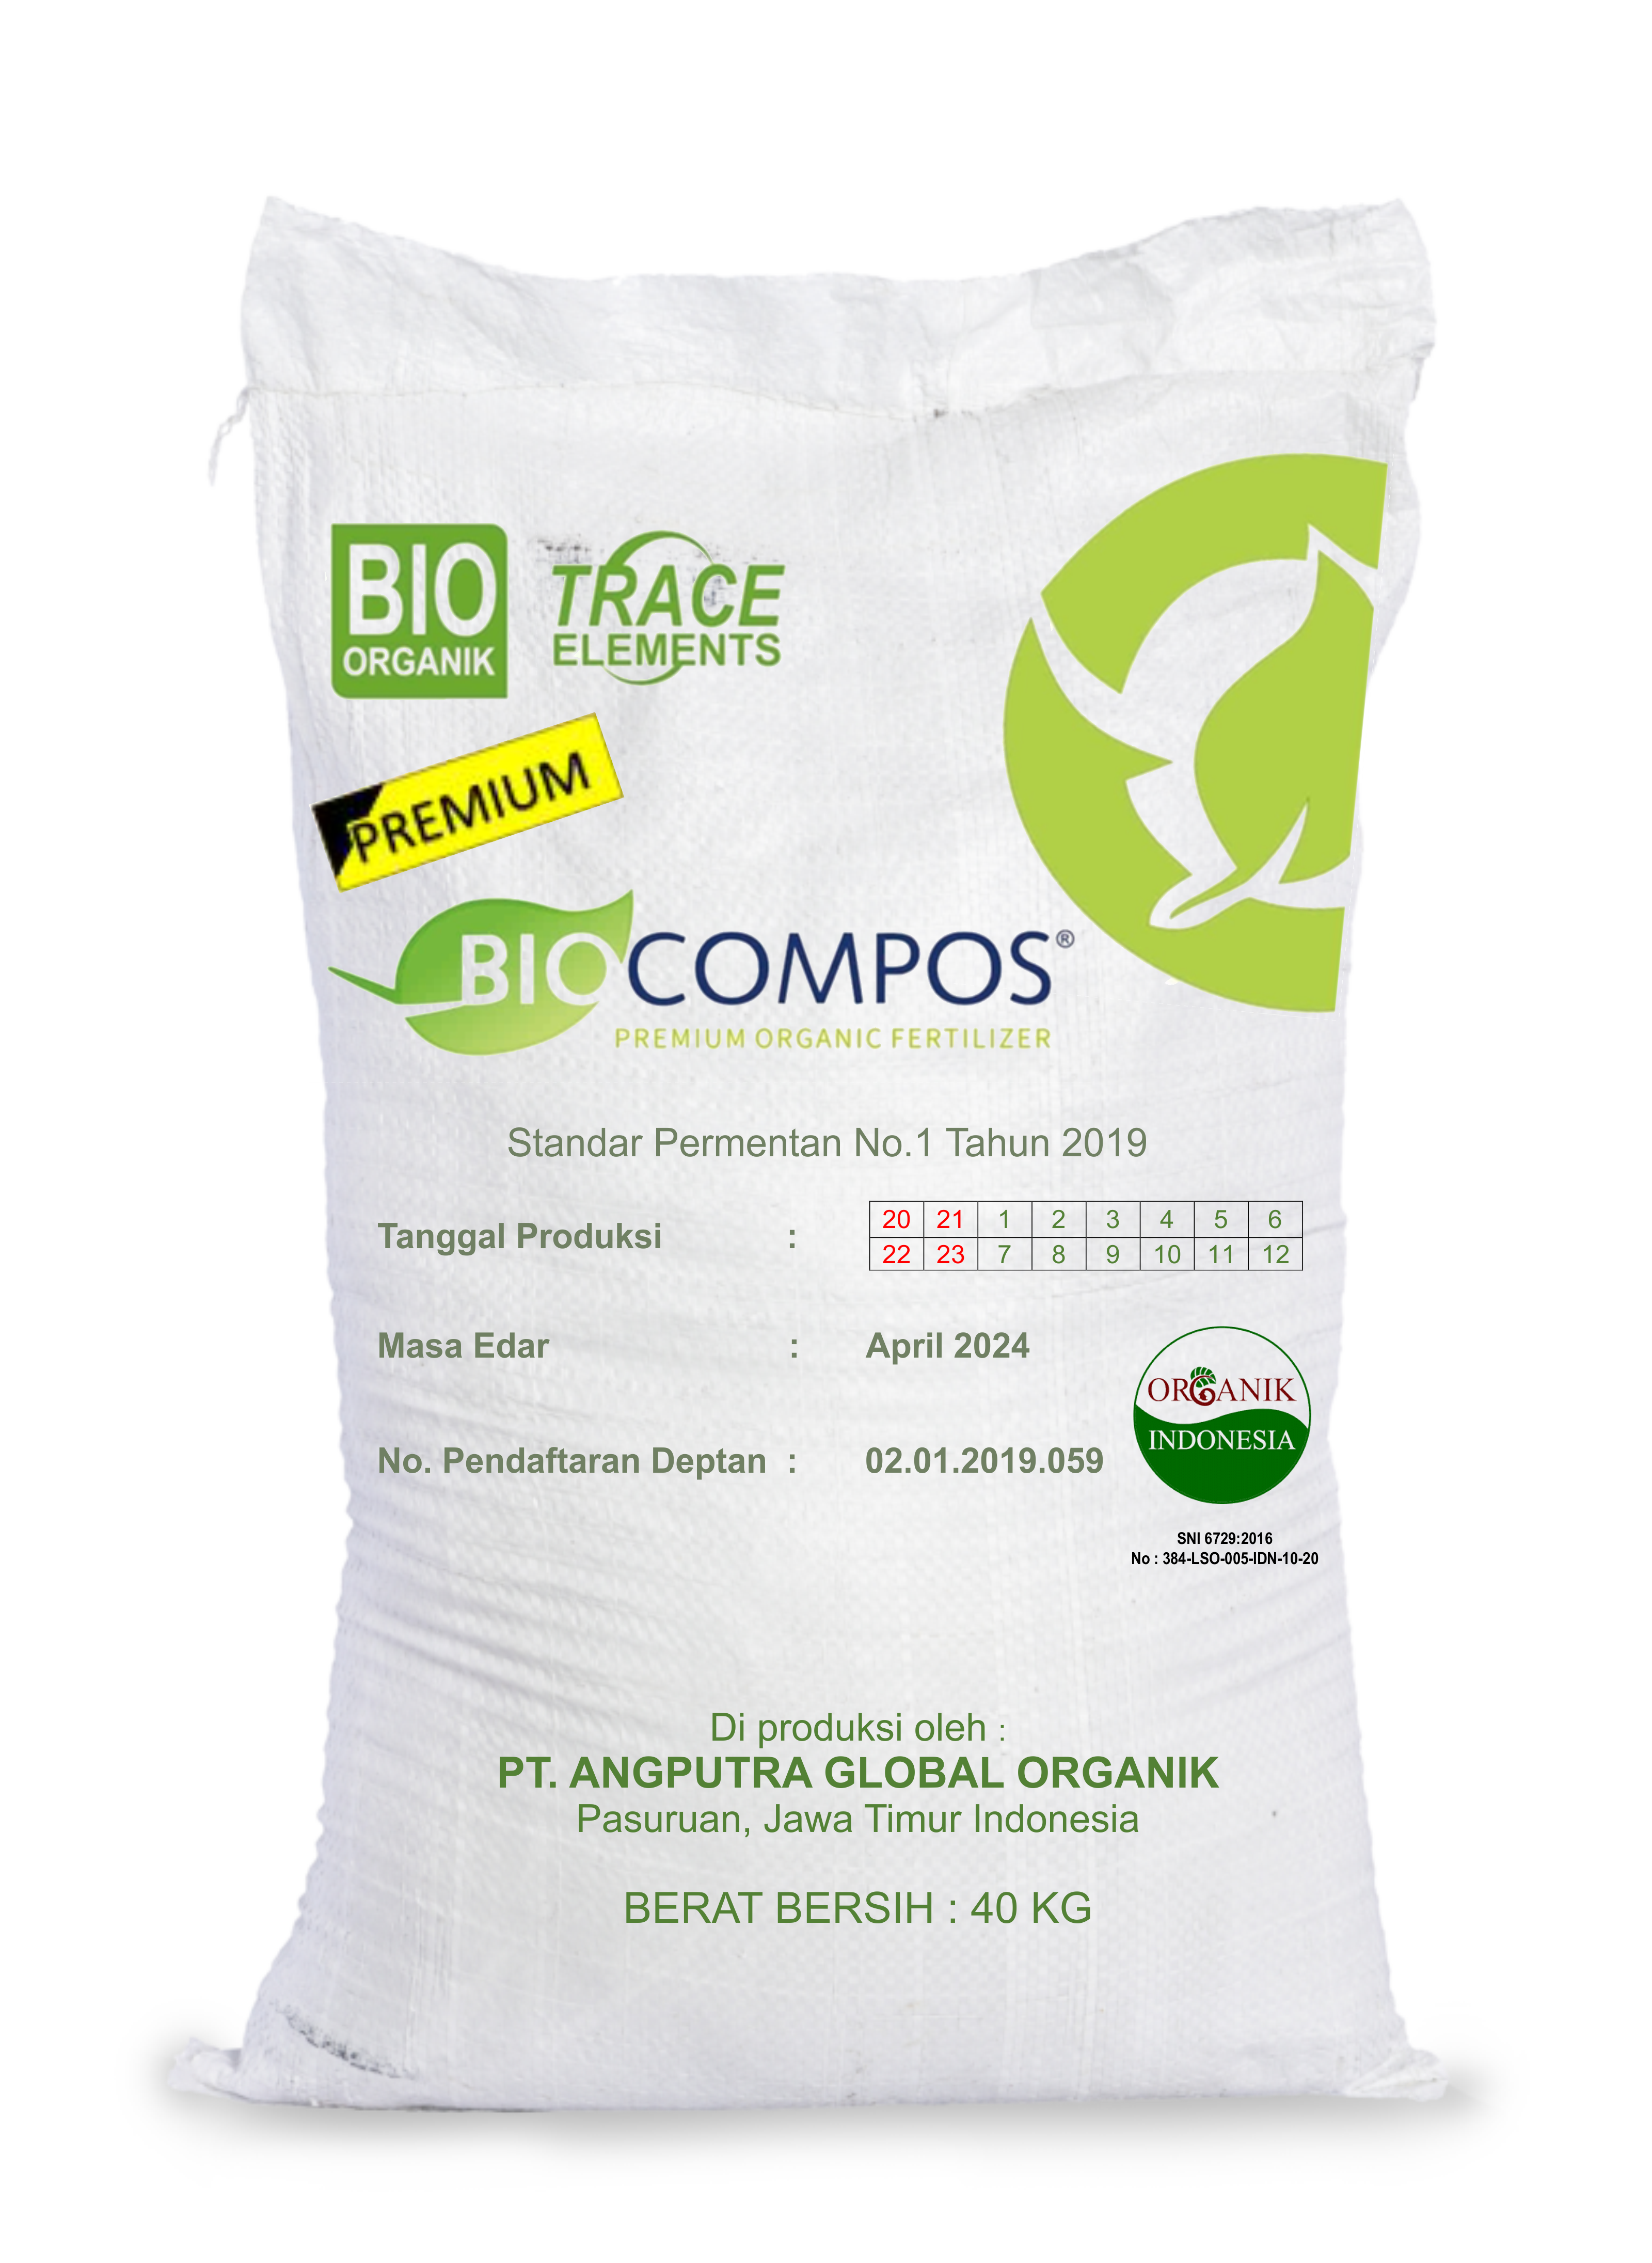 Biocompos